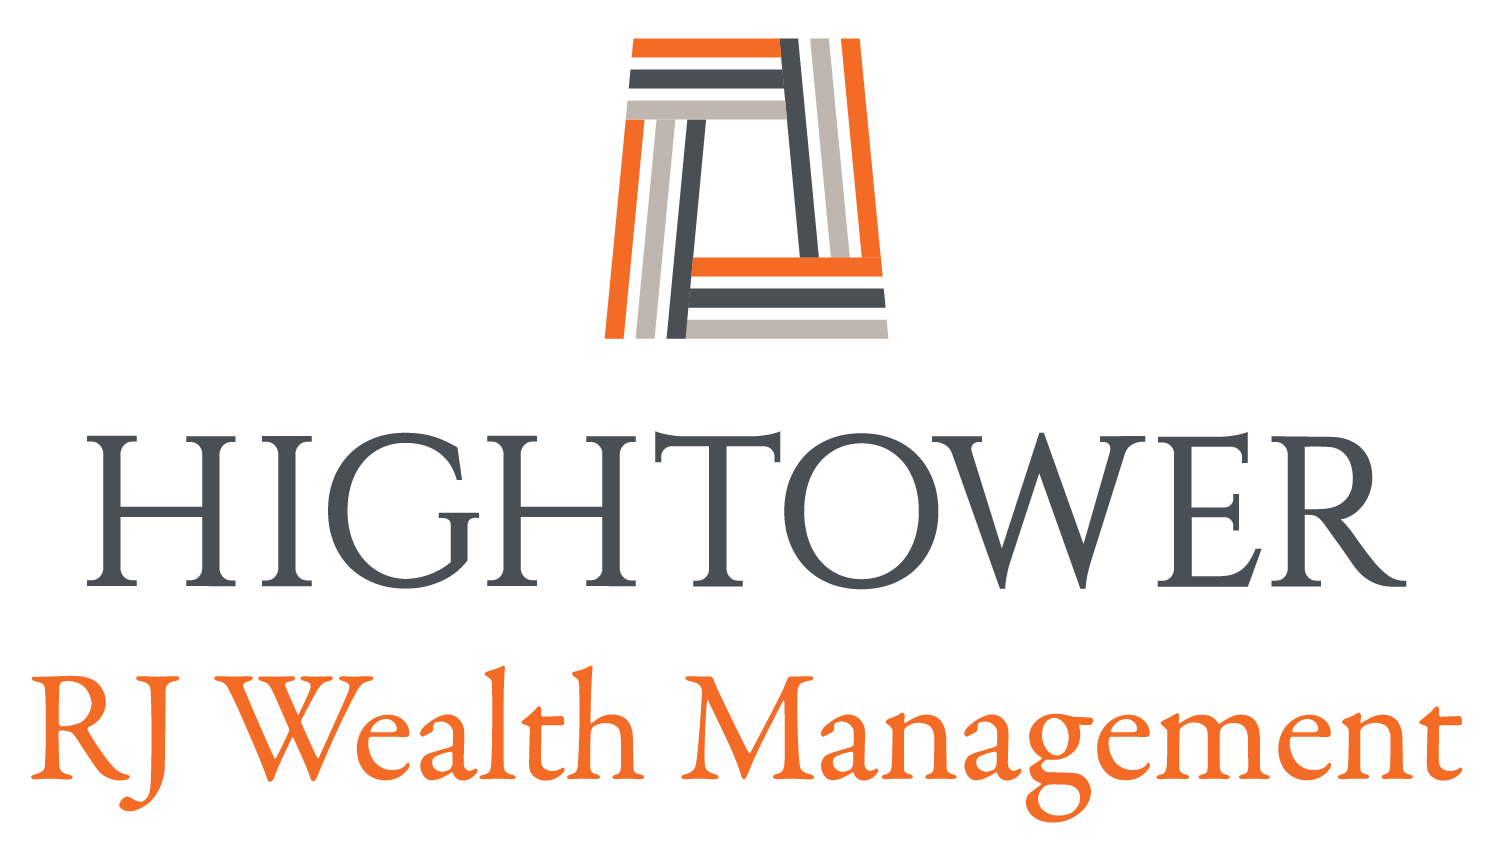 Hightower RJ Wealth Management Logo